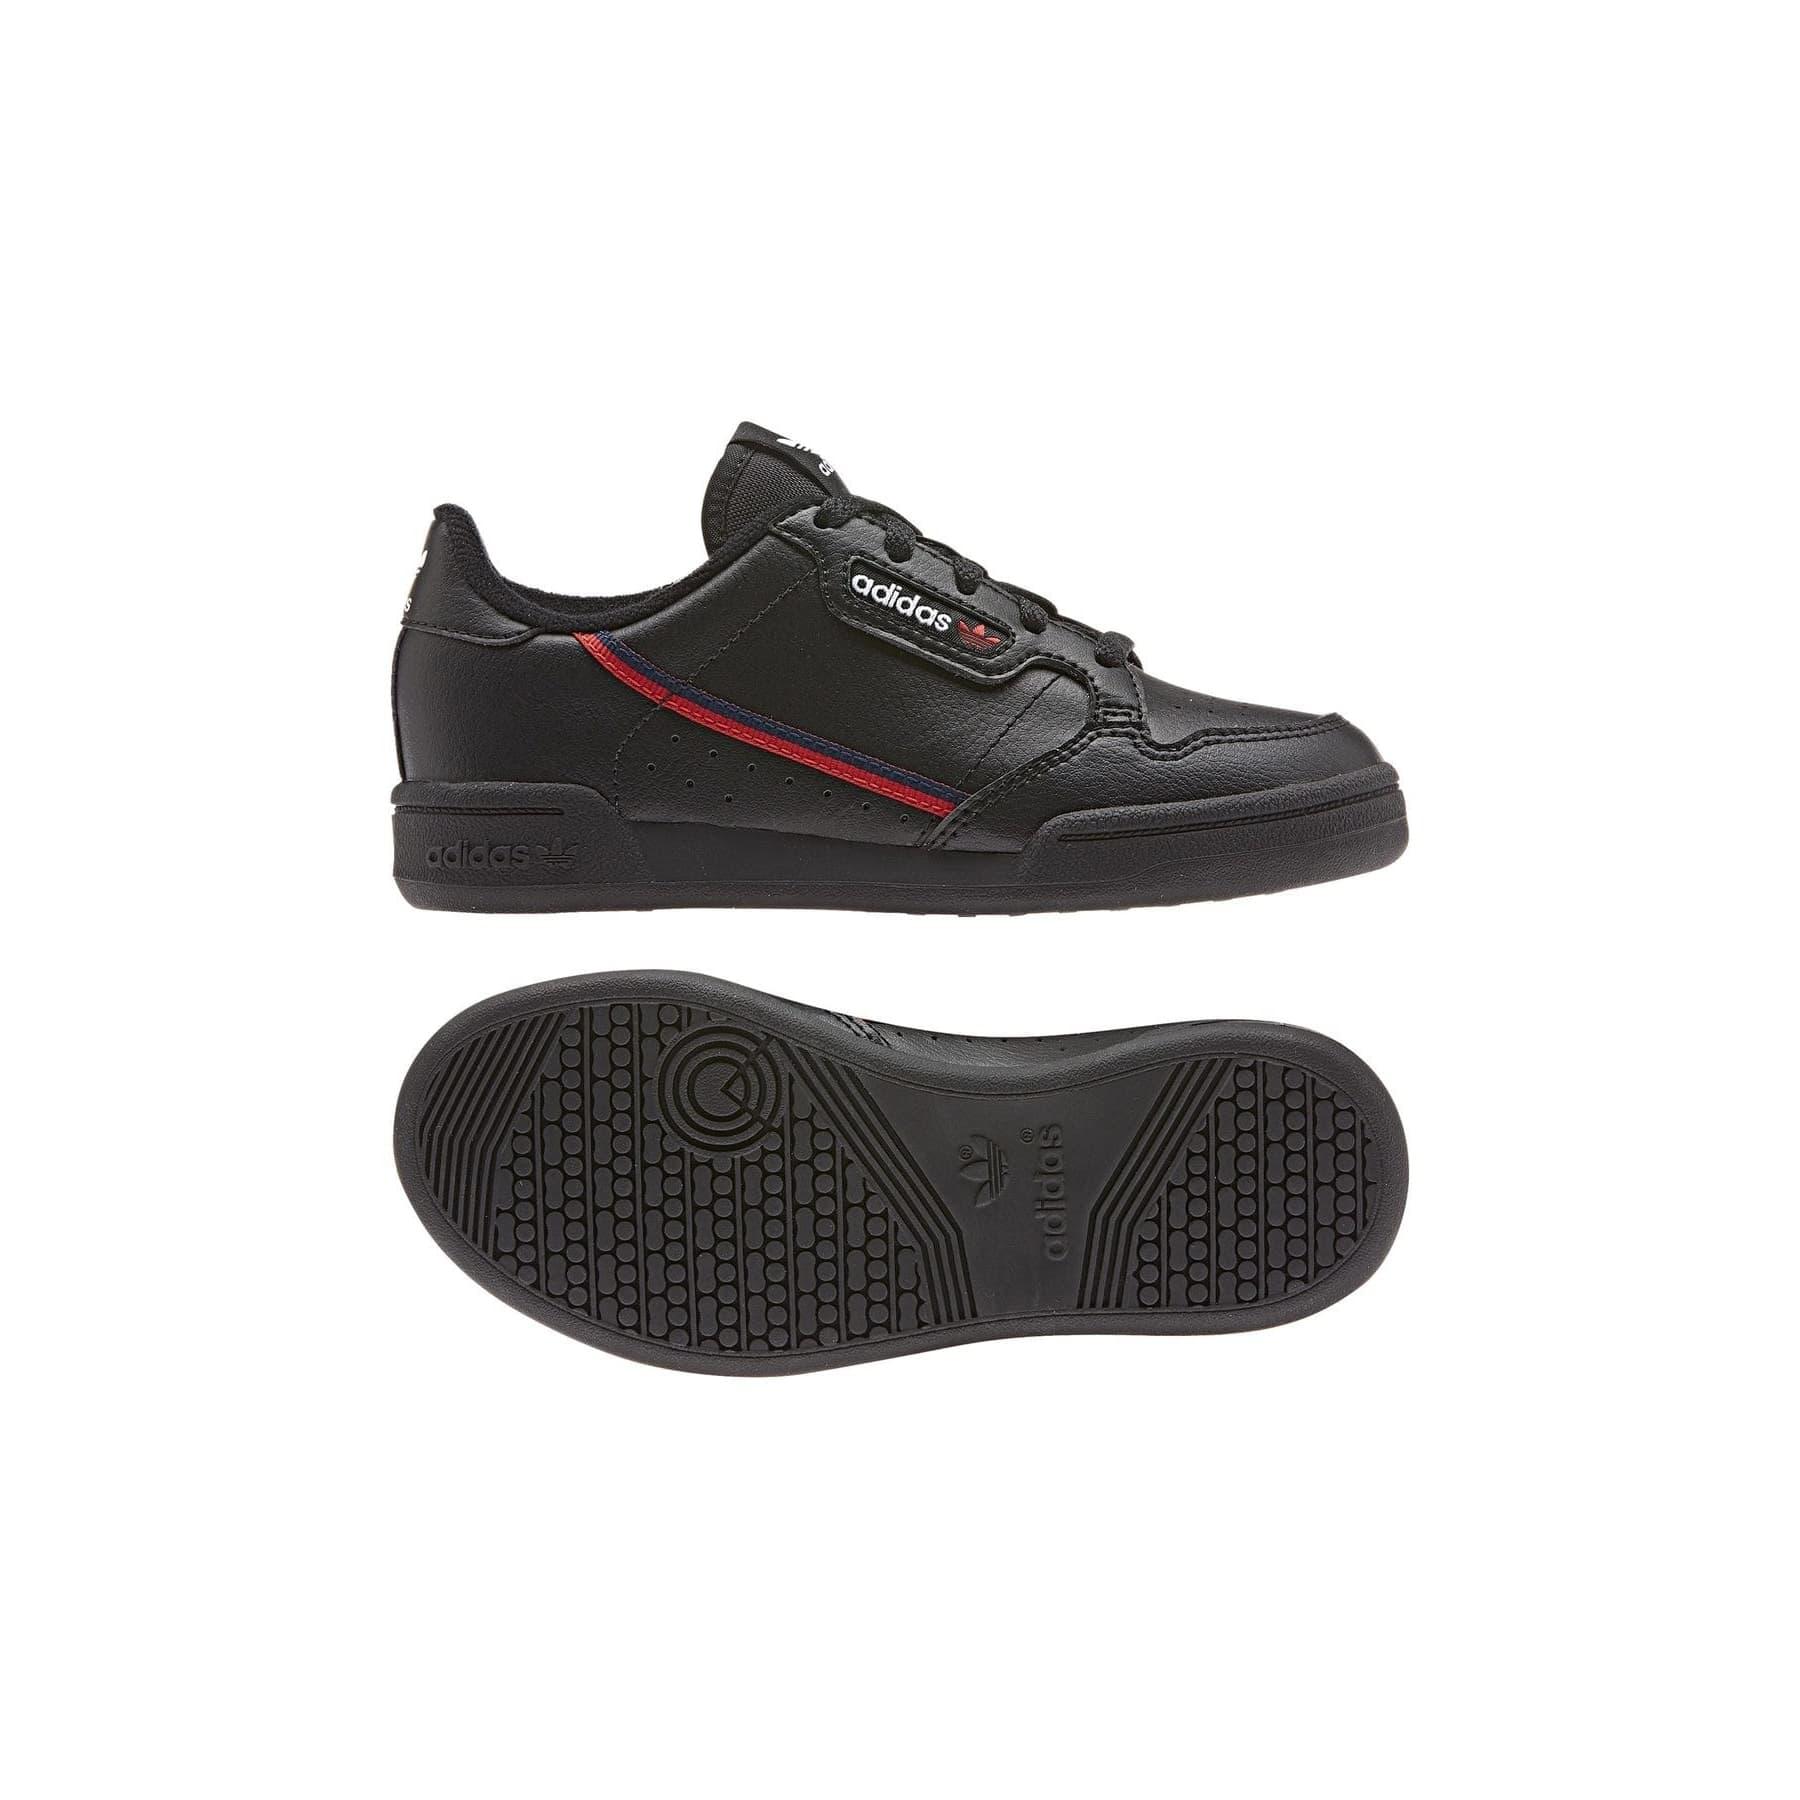 Continental 80 Çocuk Siyah Spor Ayakkabı (G28214)